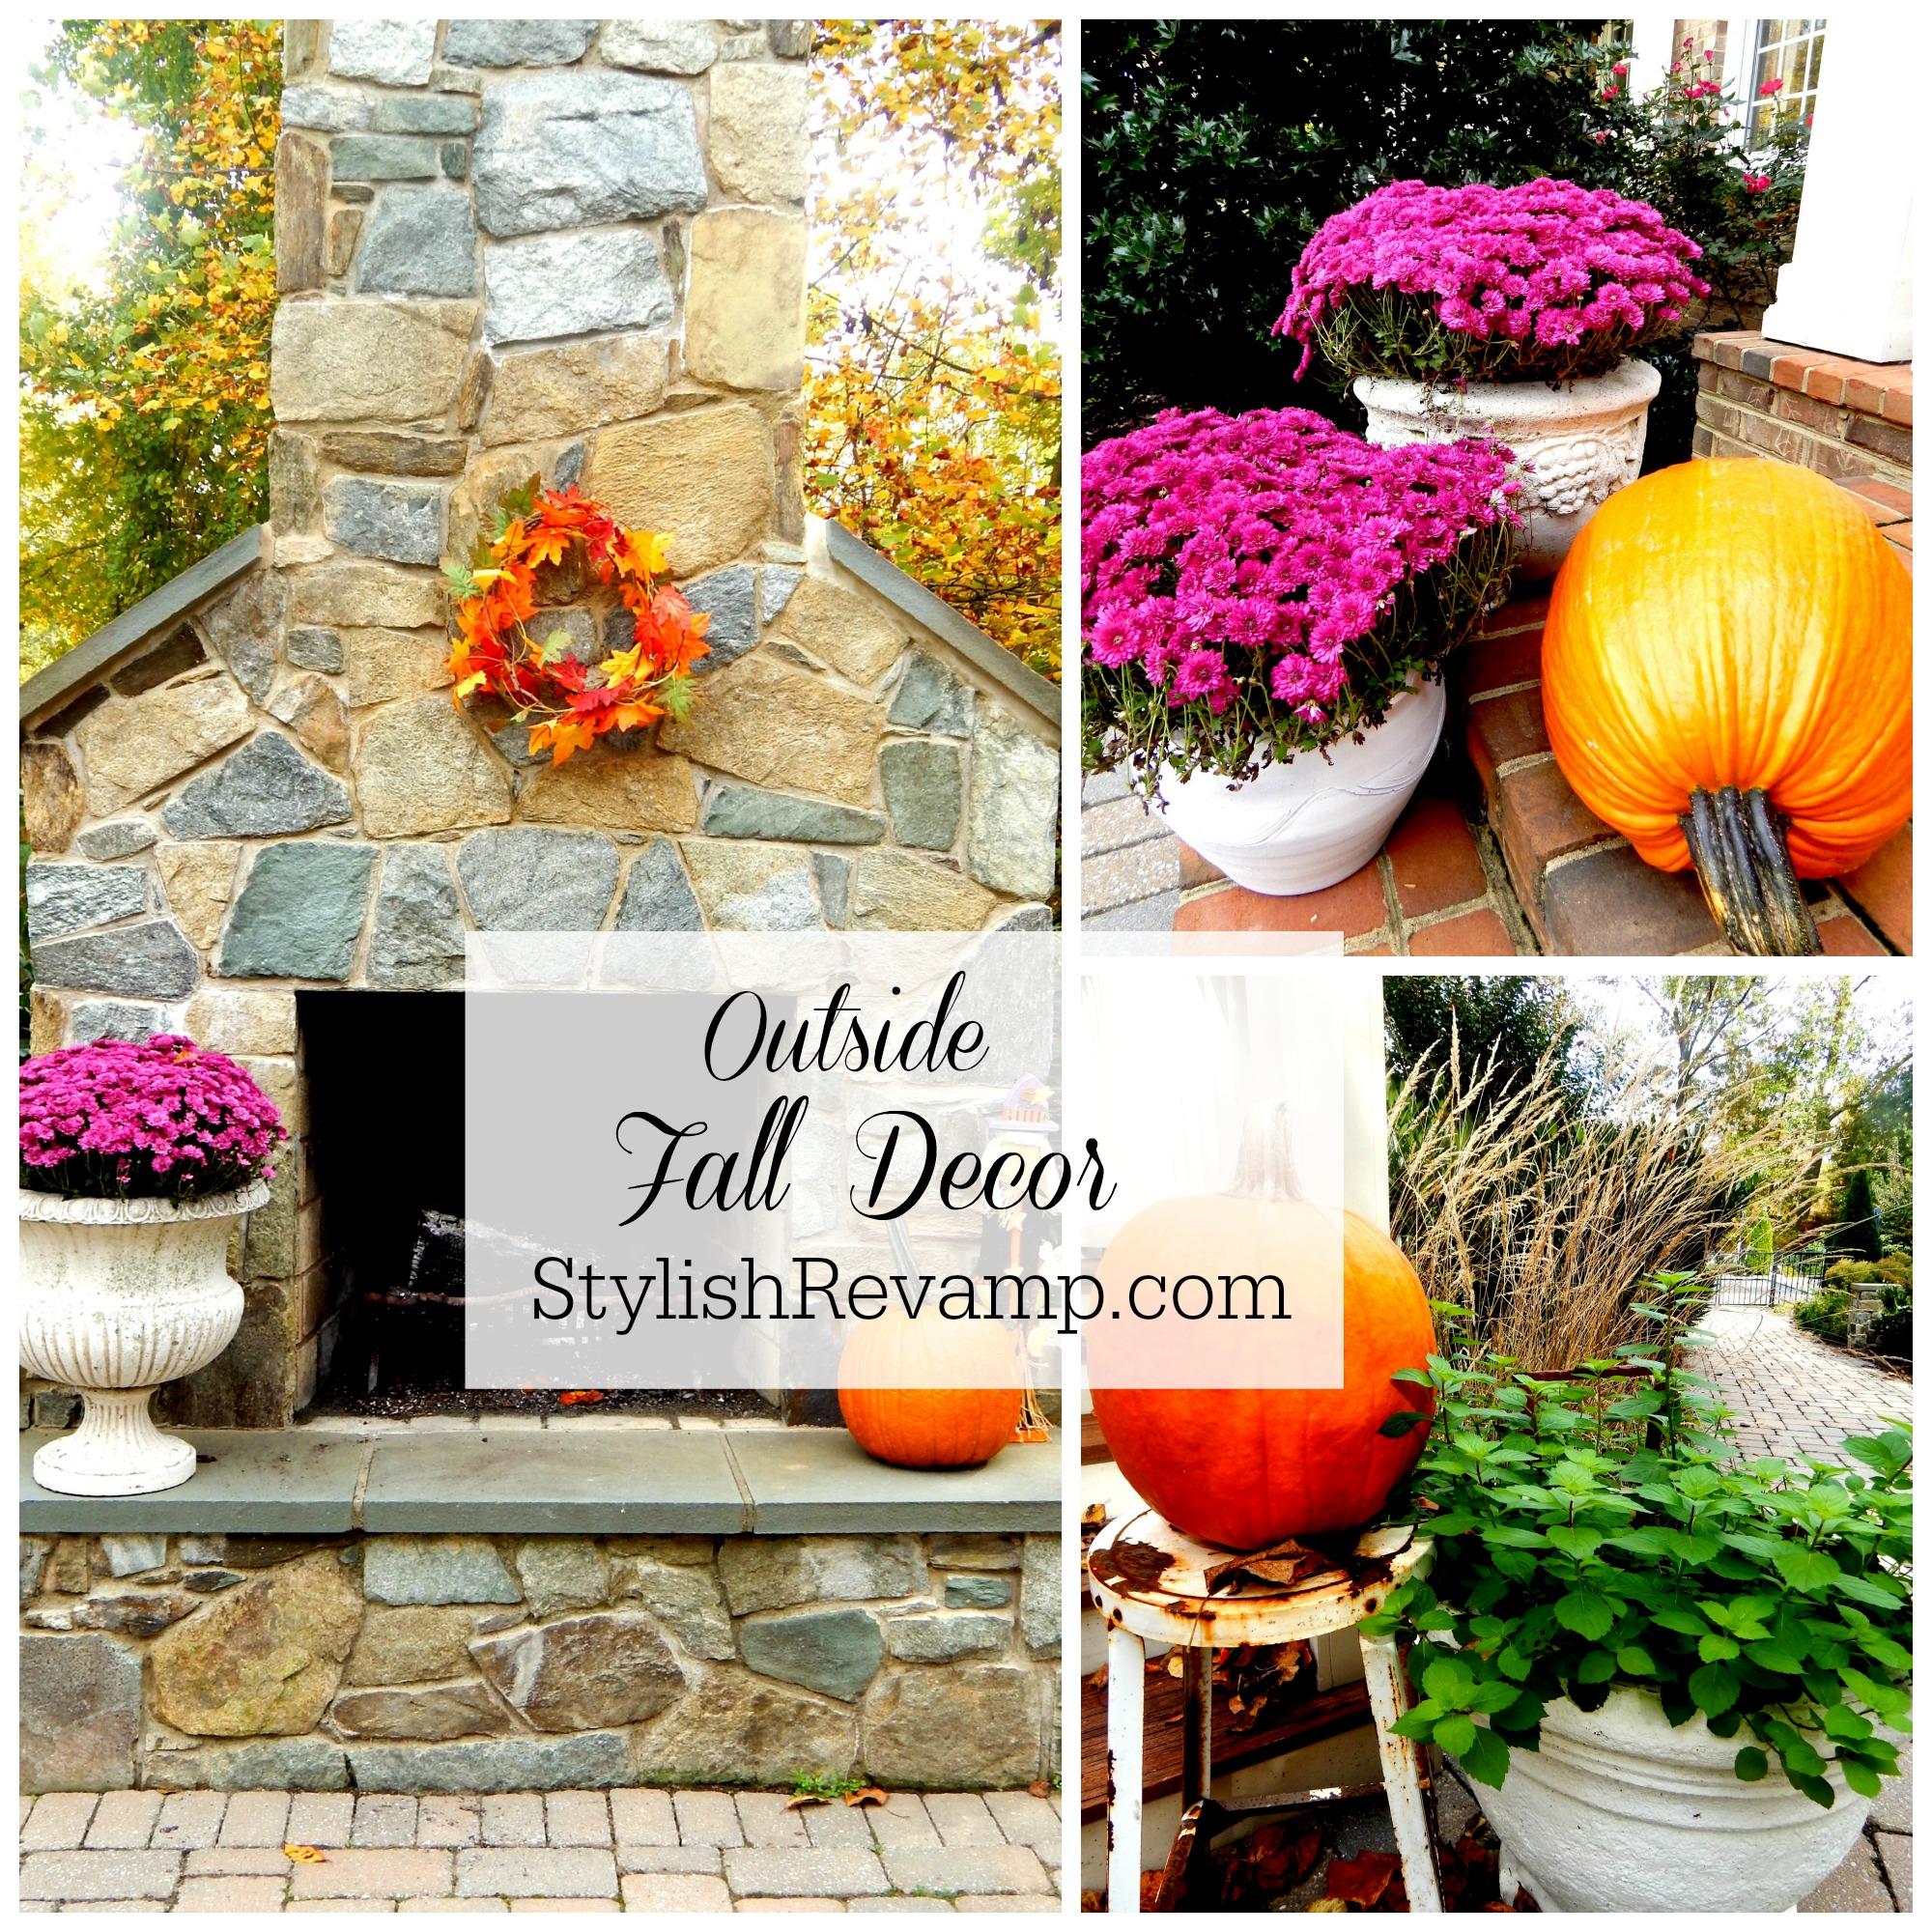 Outside Fall Decorations: Stylish Revamp